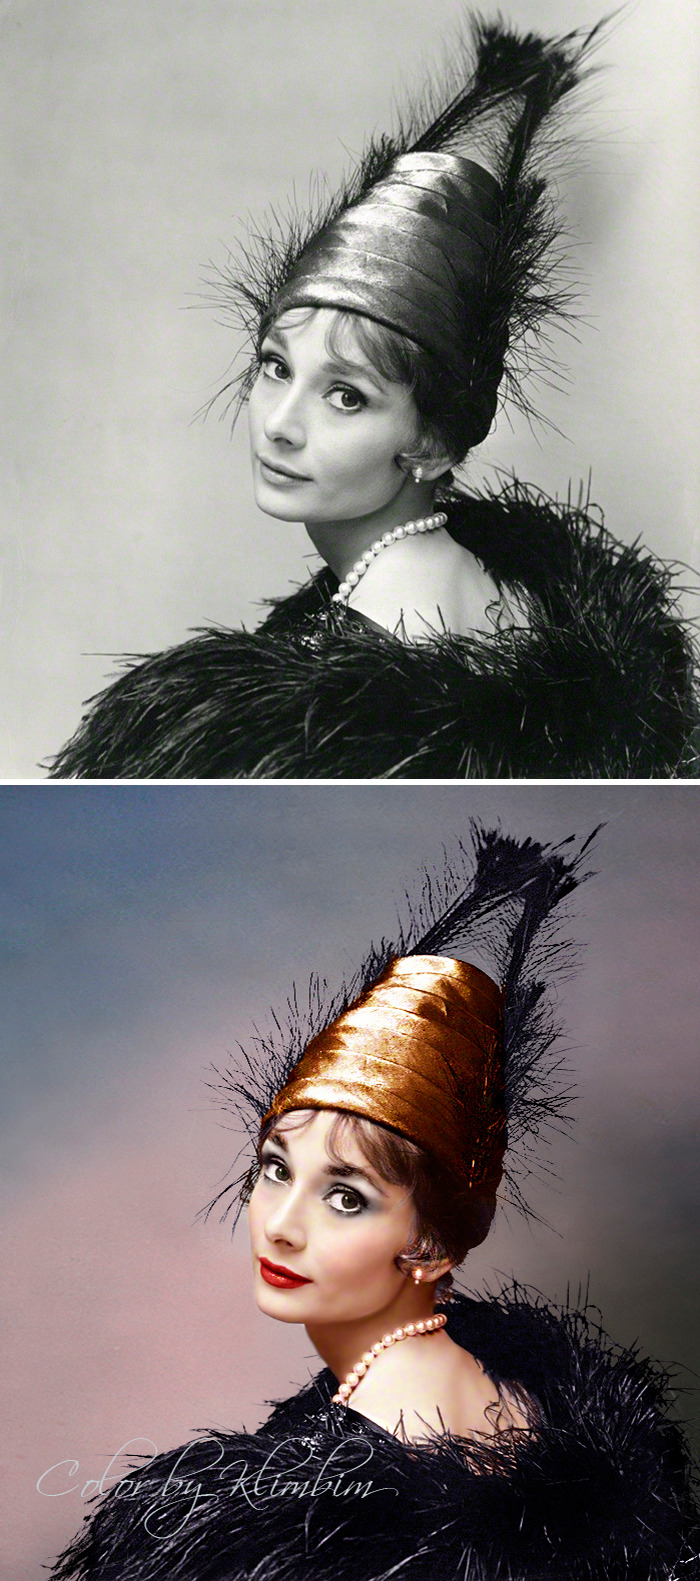 5e69f0c28d7a8 This Russian artist impresses by giving vivid colors to photos of celebrities from the past 5e679b1ee16ac png  700 - Fotos antigas coloridas de estrelas clássicas de Hollywood